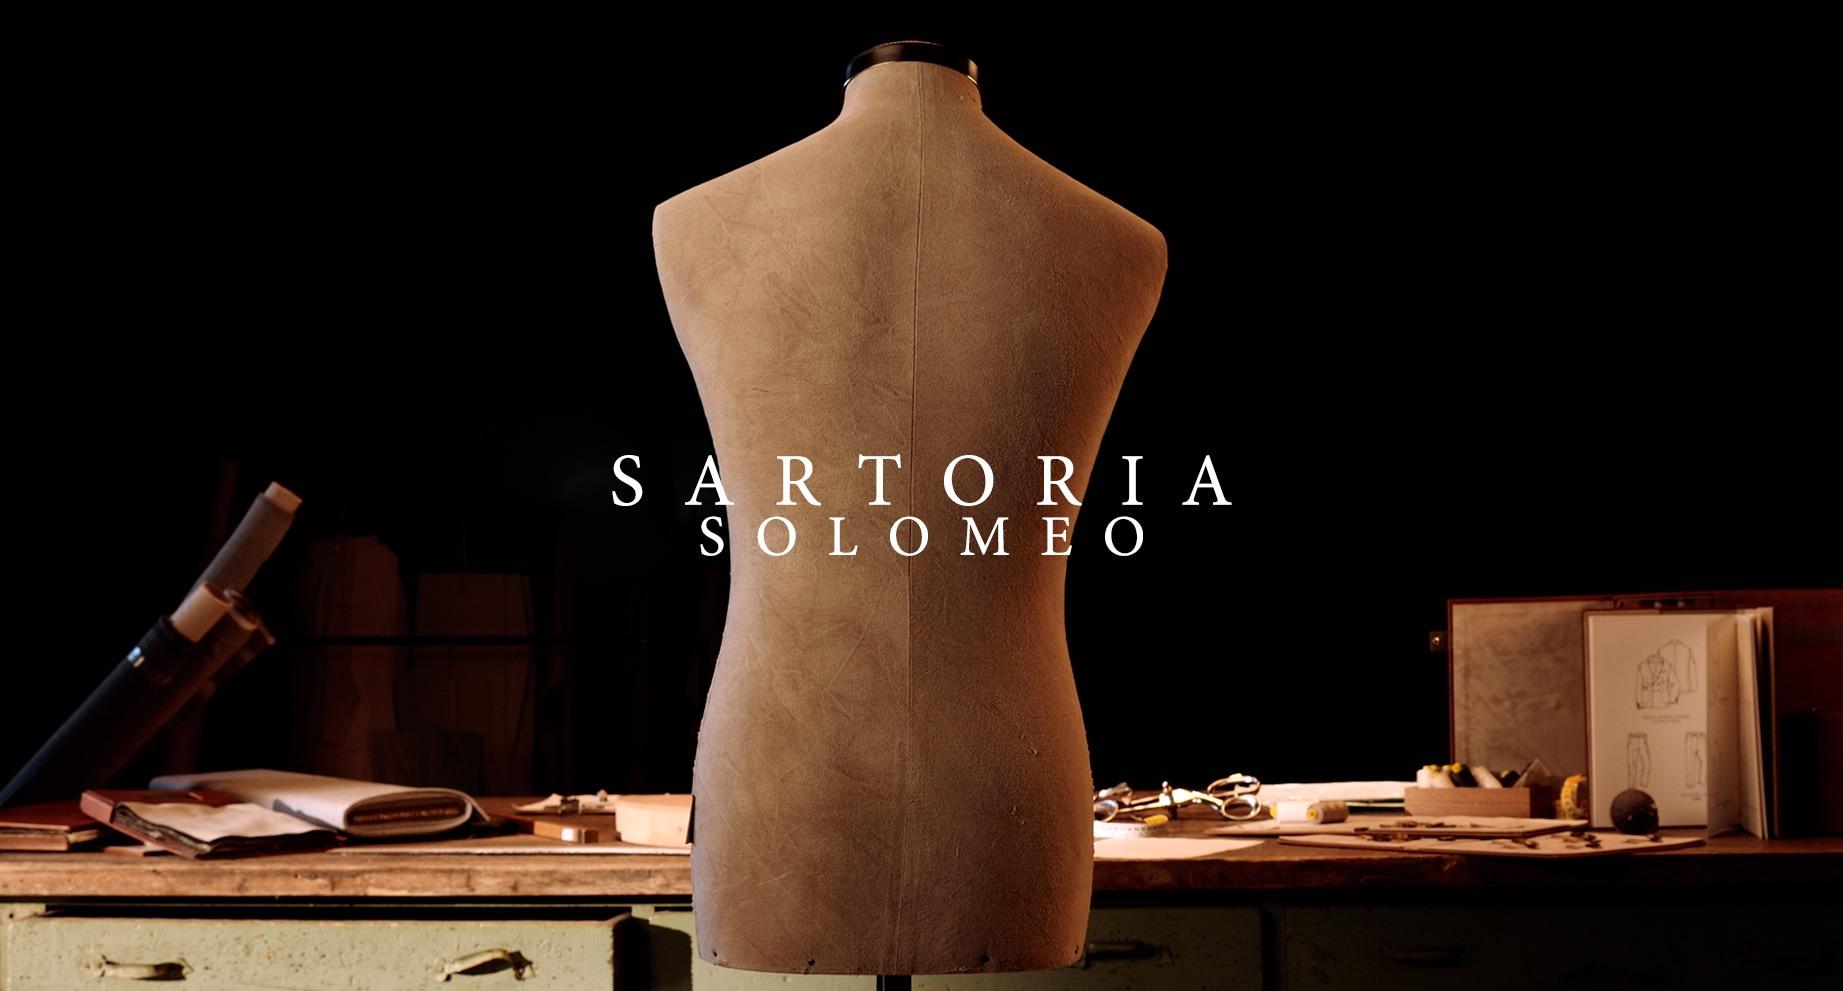 Sartoria Solomeo - Inspiration